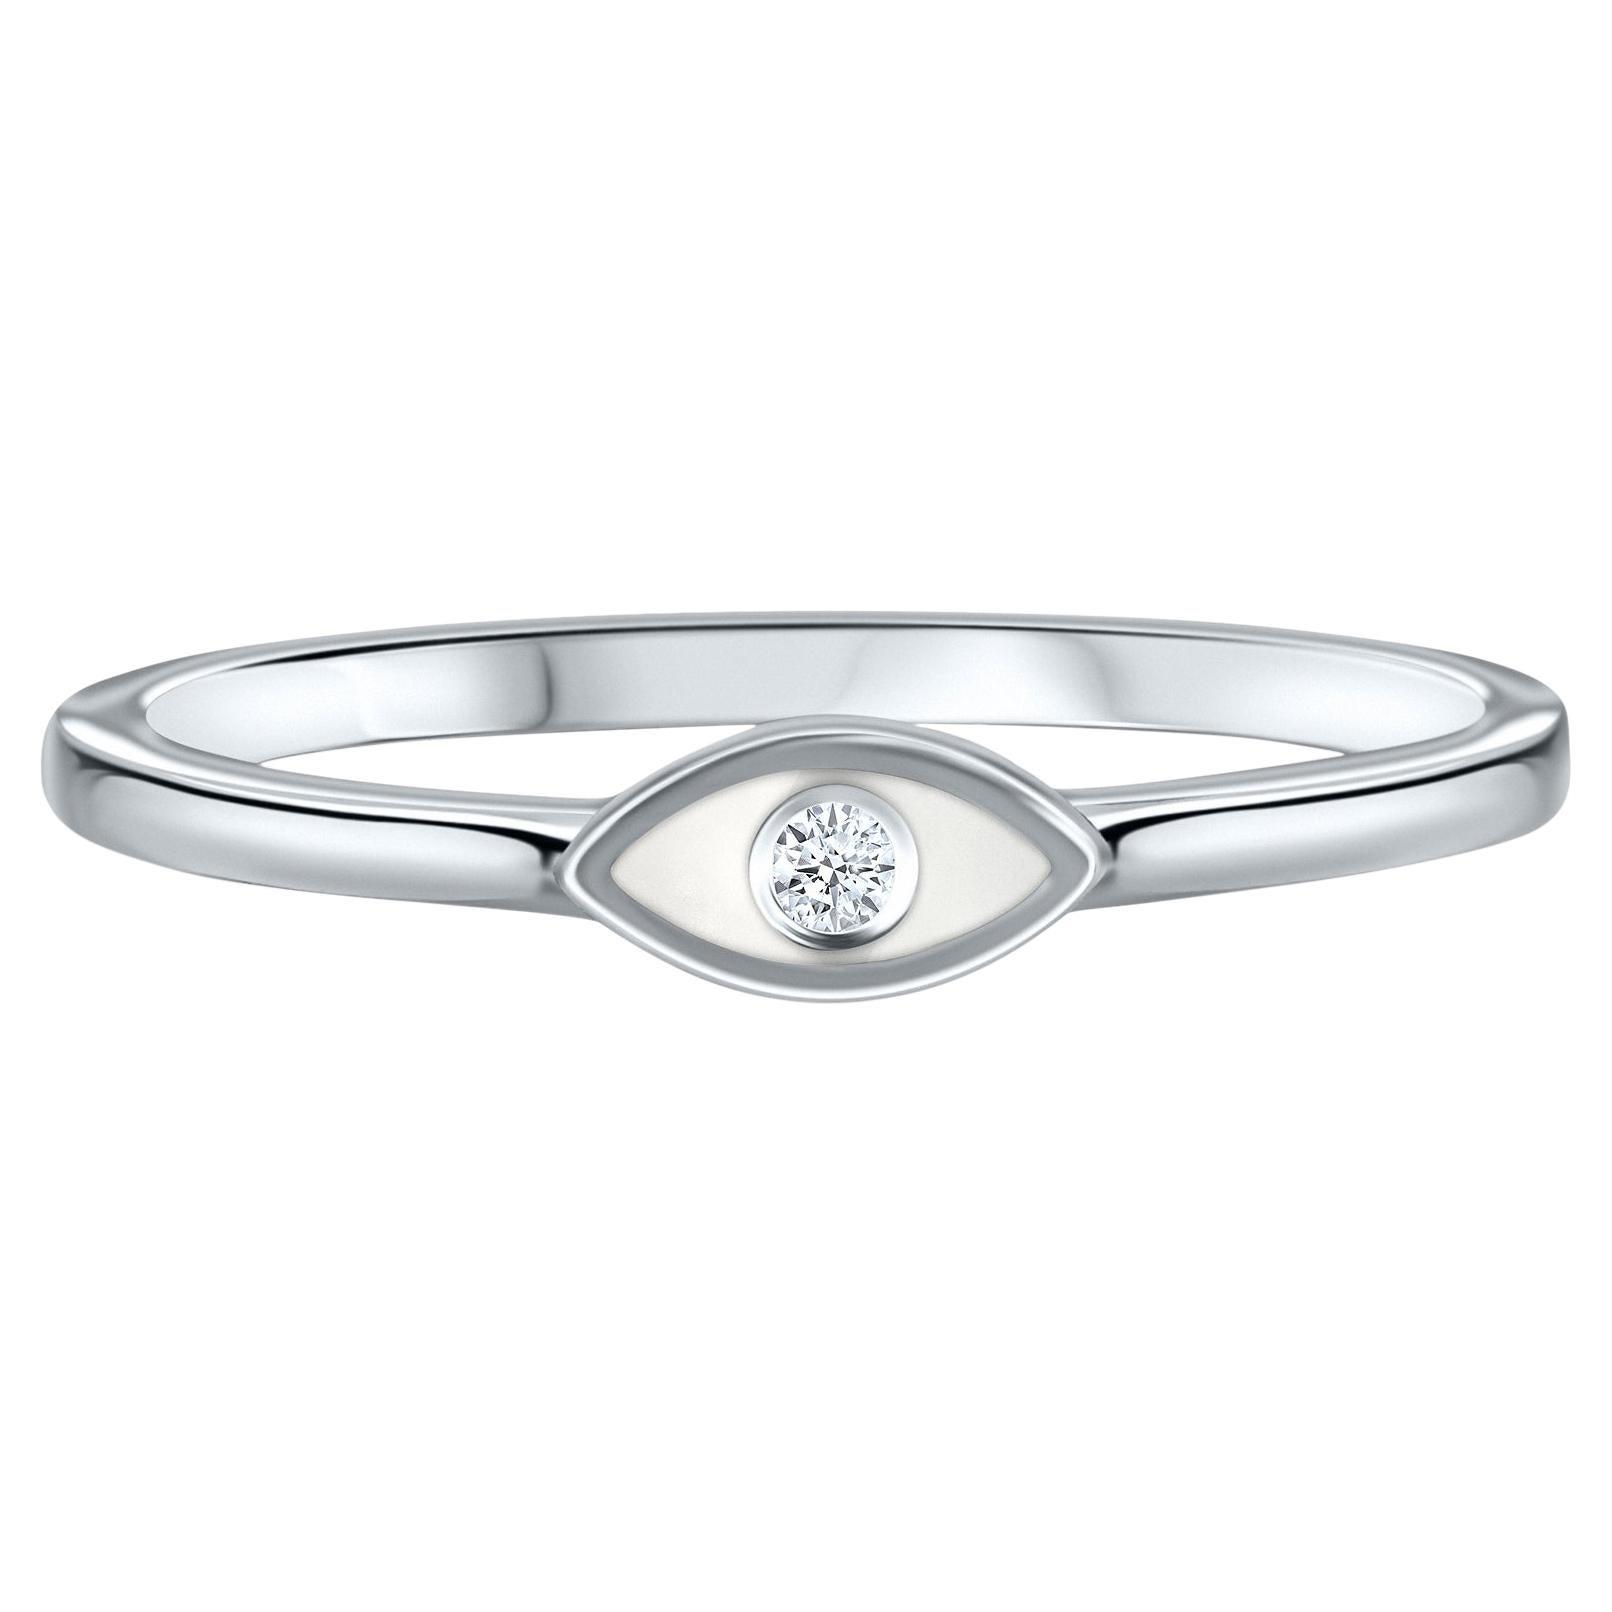 Diamond White Enamel Evil Eye Ring in 14K White Gold, Shlomit Rogel